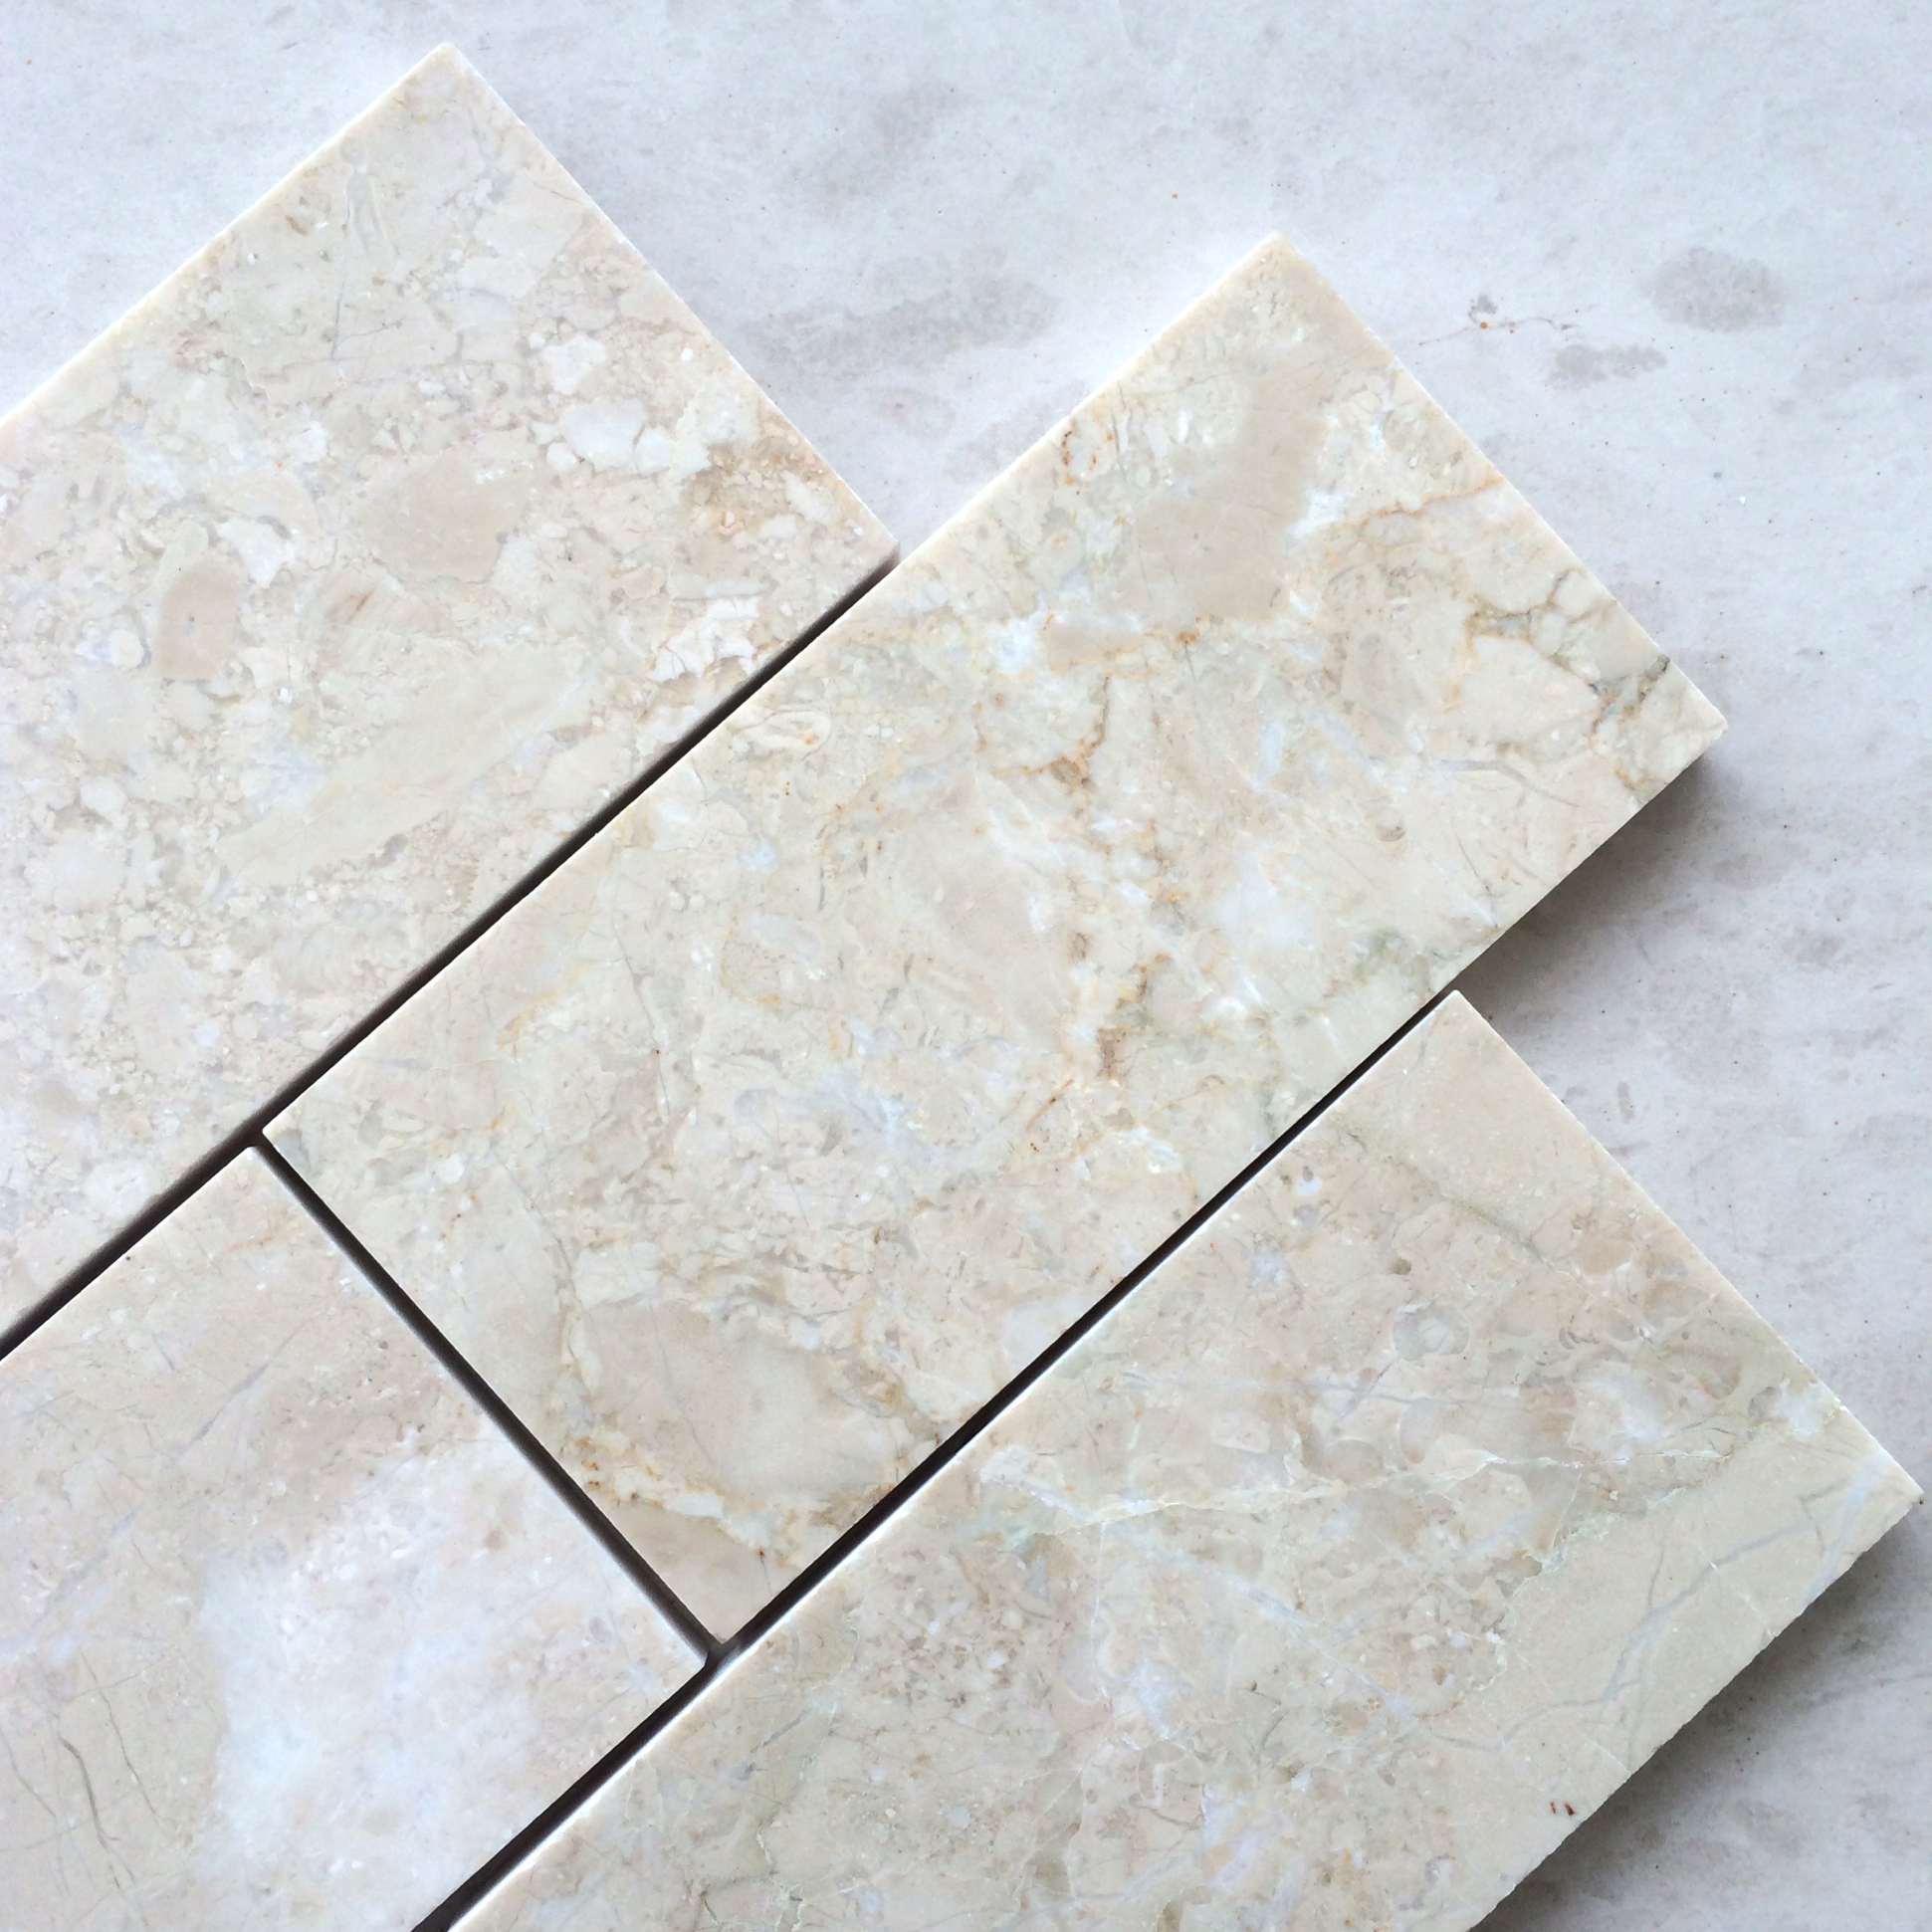 Tile Floor Design Ideas in addition Carrara Marble Bathroom further 3x6 Marble Subway Tiles Bathroom Kitchen besides 36 Bathroom Flooring Ideas further White Carrara Subway Backsplash Tile. on white carrara marble bathroom ideas